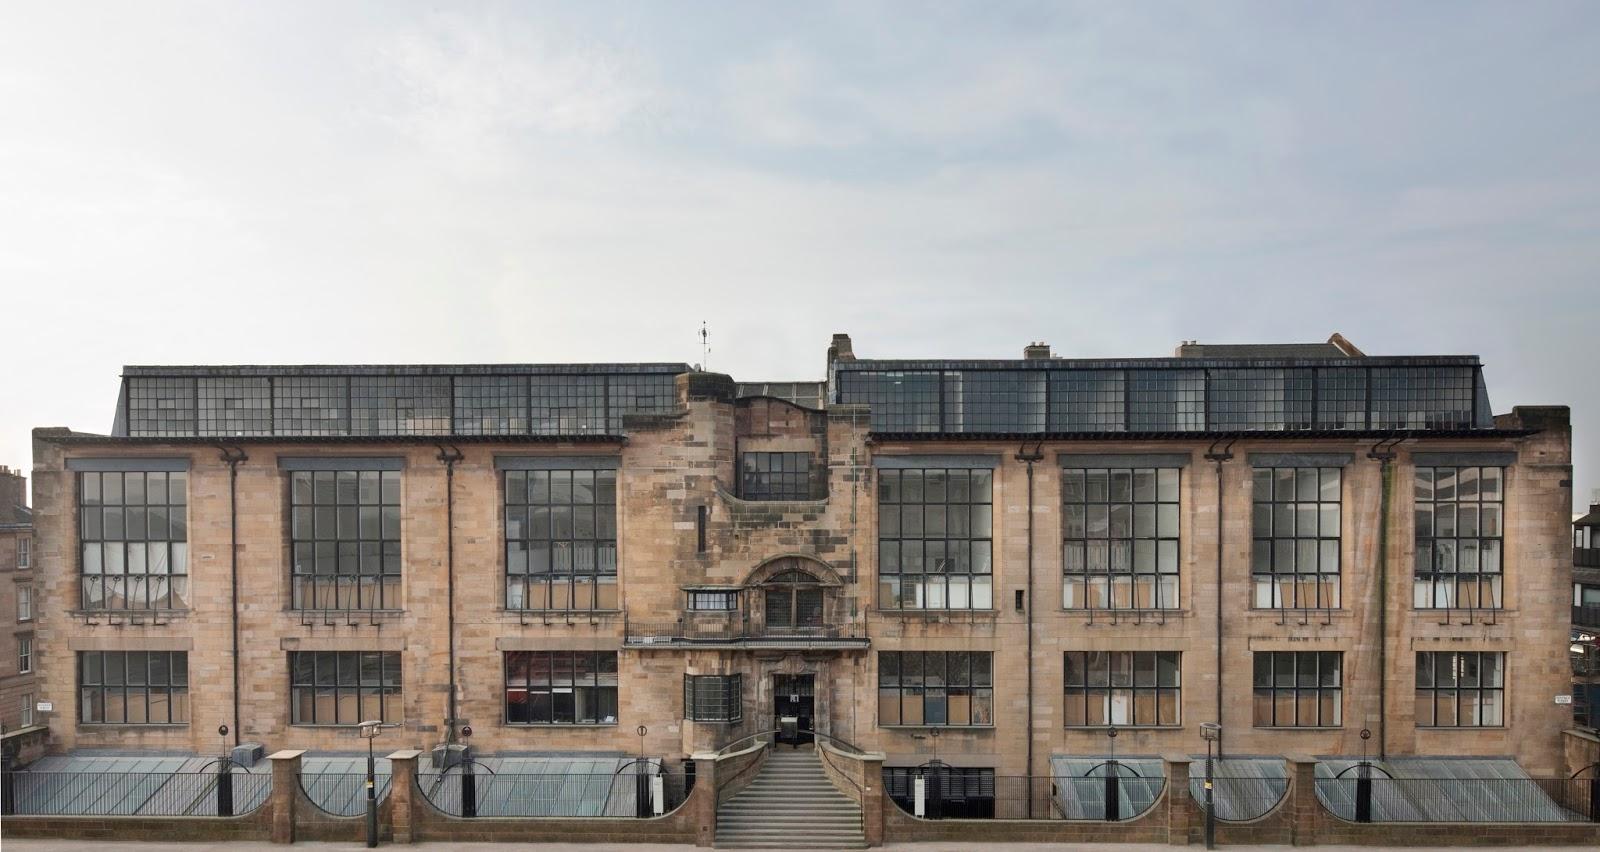 Who Designed The Glasgow School Of Art